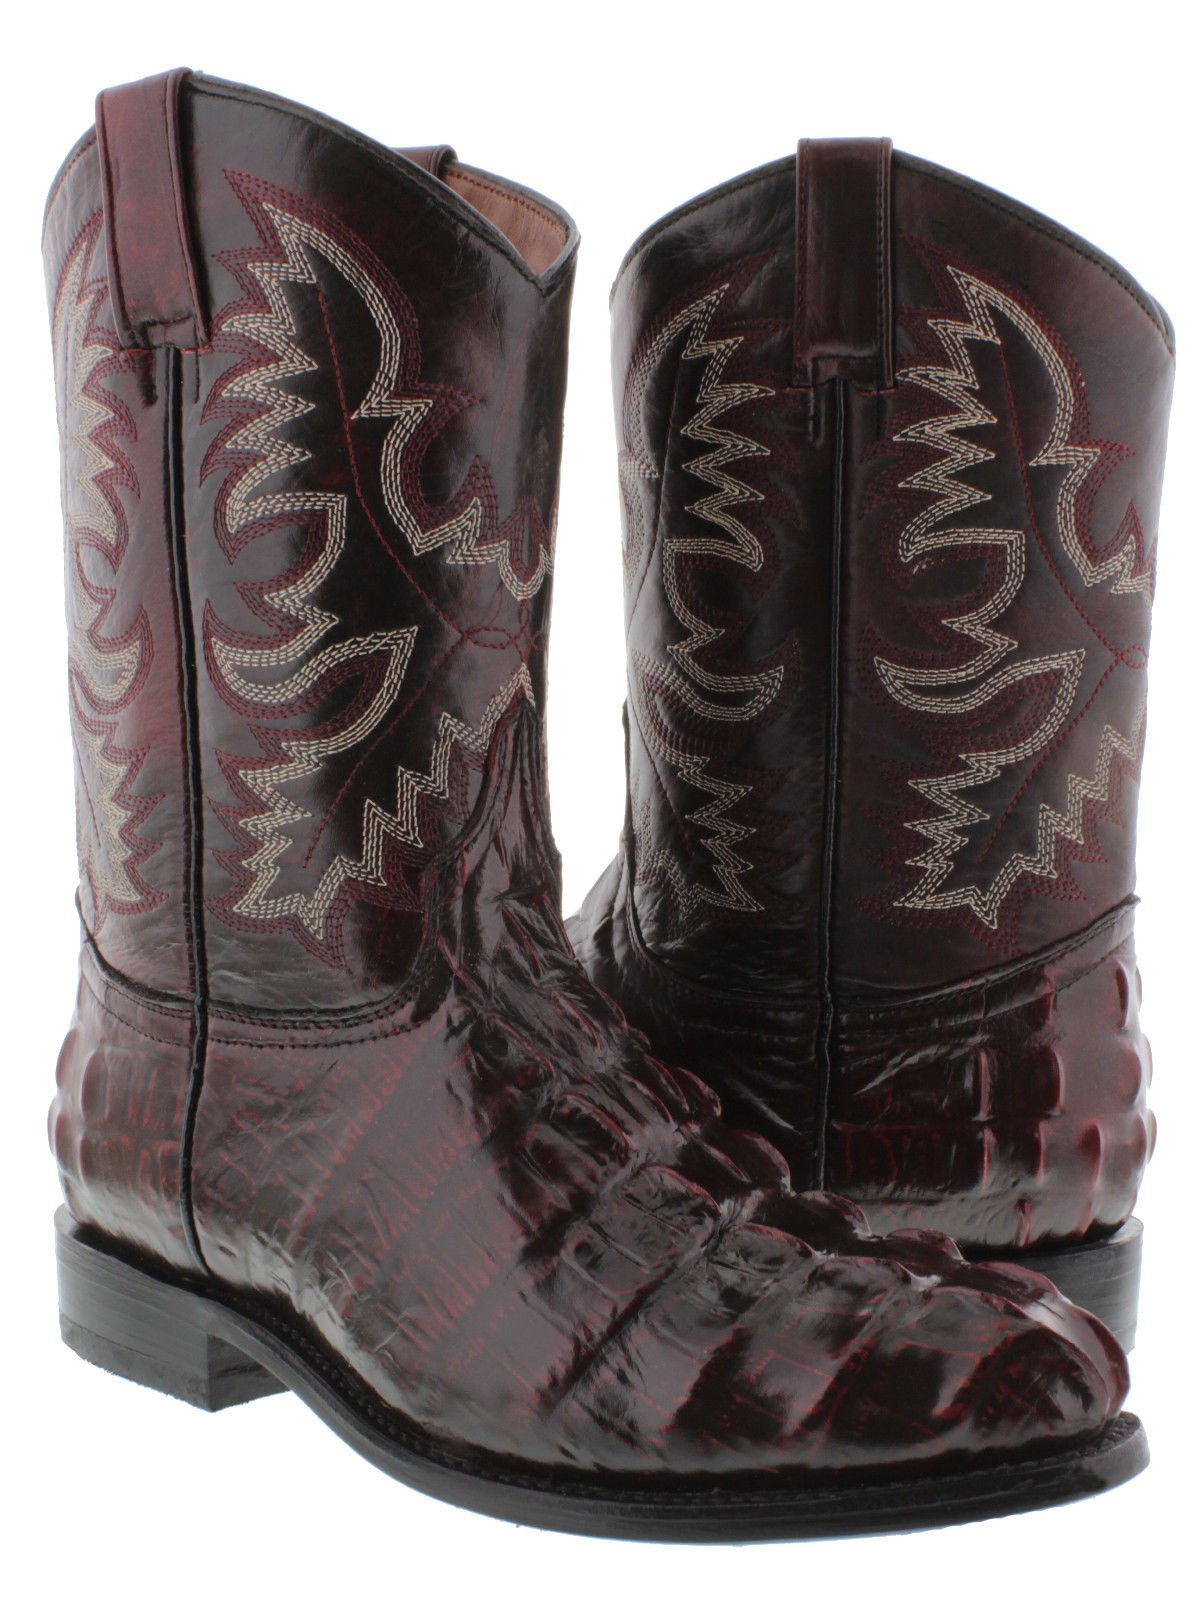 El Presidente Men's Black Cherry Crocodile Tail Design Leather Cowboy Boots Roper 7 D